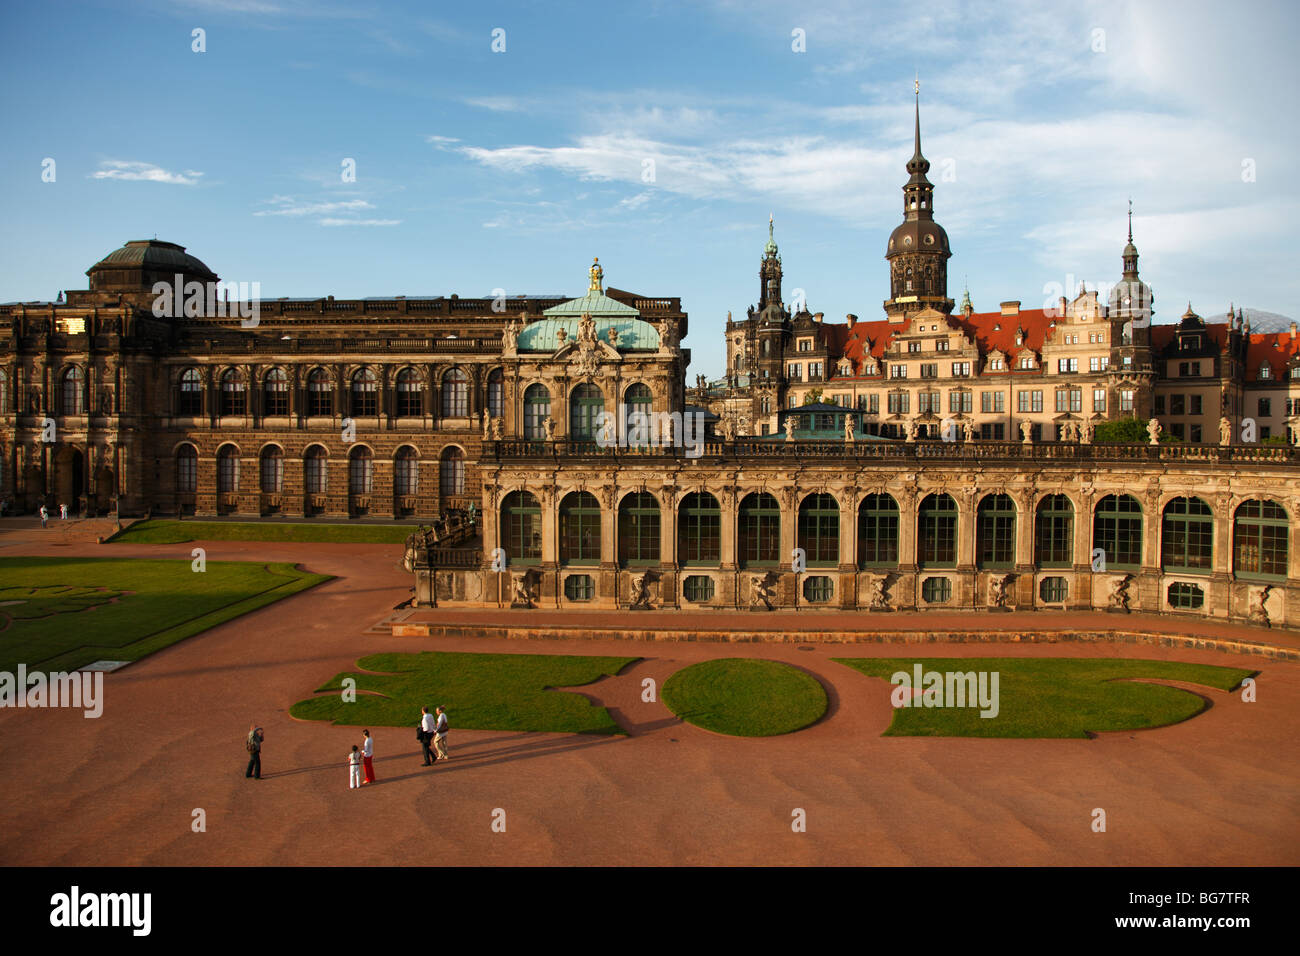 Germany Saxony Dresden Zwinger Palace Mathematisch-Physikalischer Salon Mathematical-Physical Sciences Salon Hausmann - Stock Image